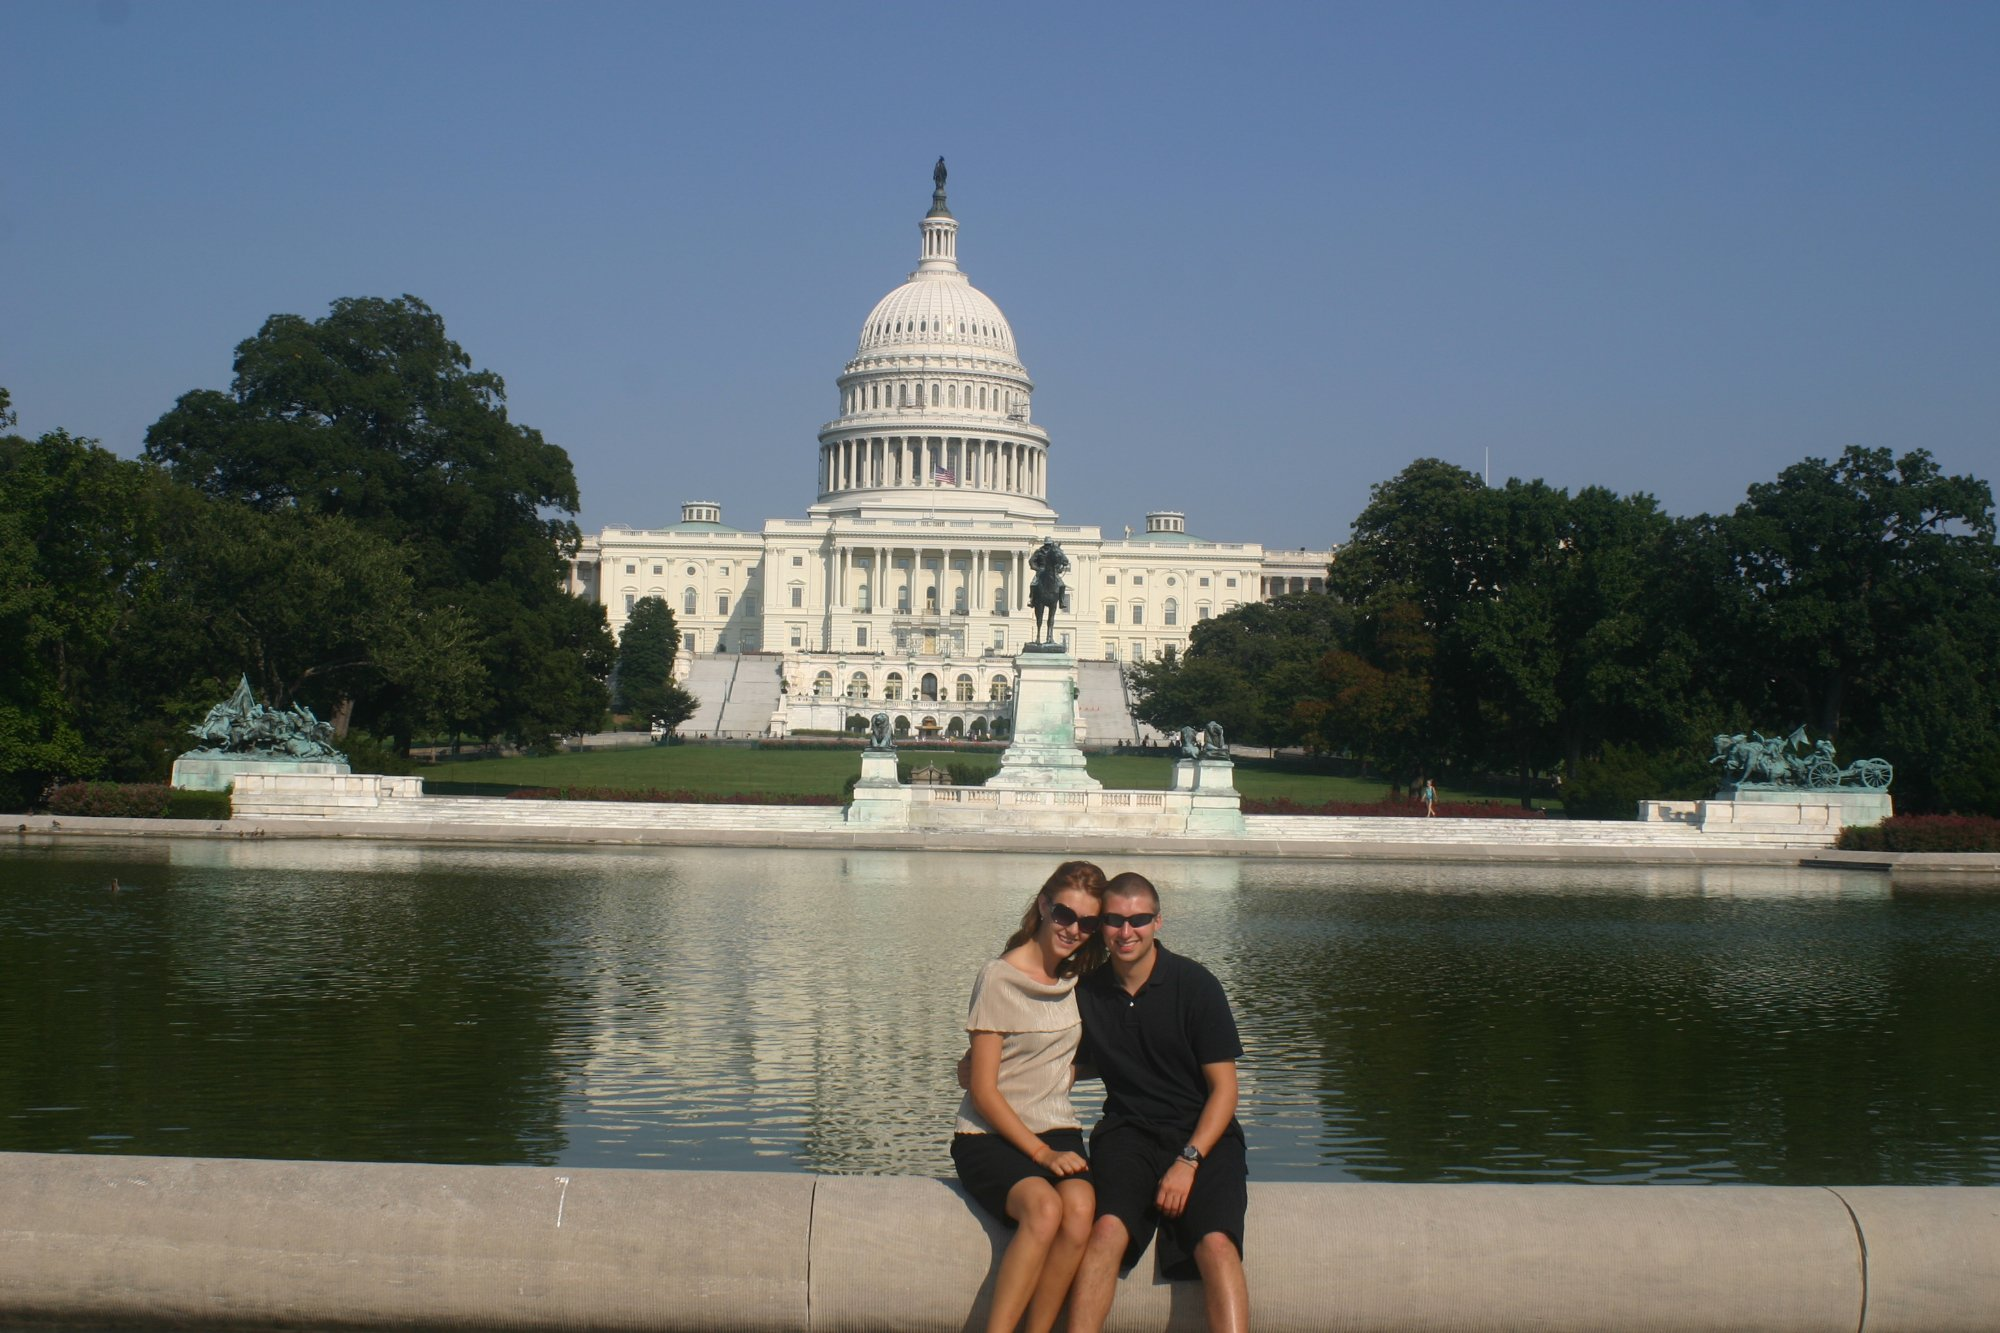 Sarah & I enjoying the city